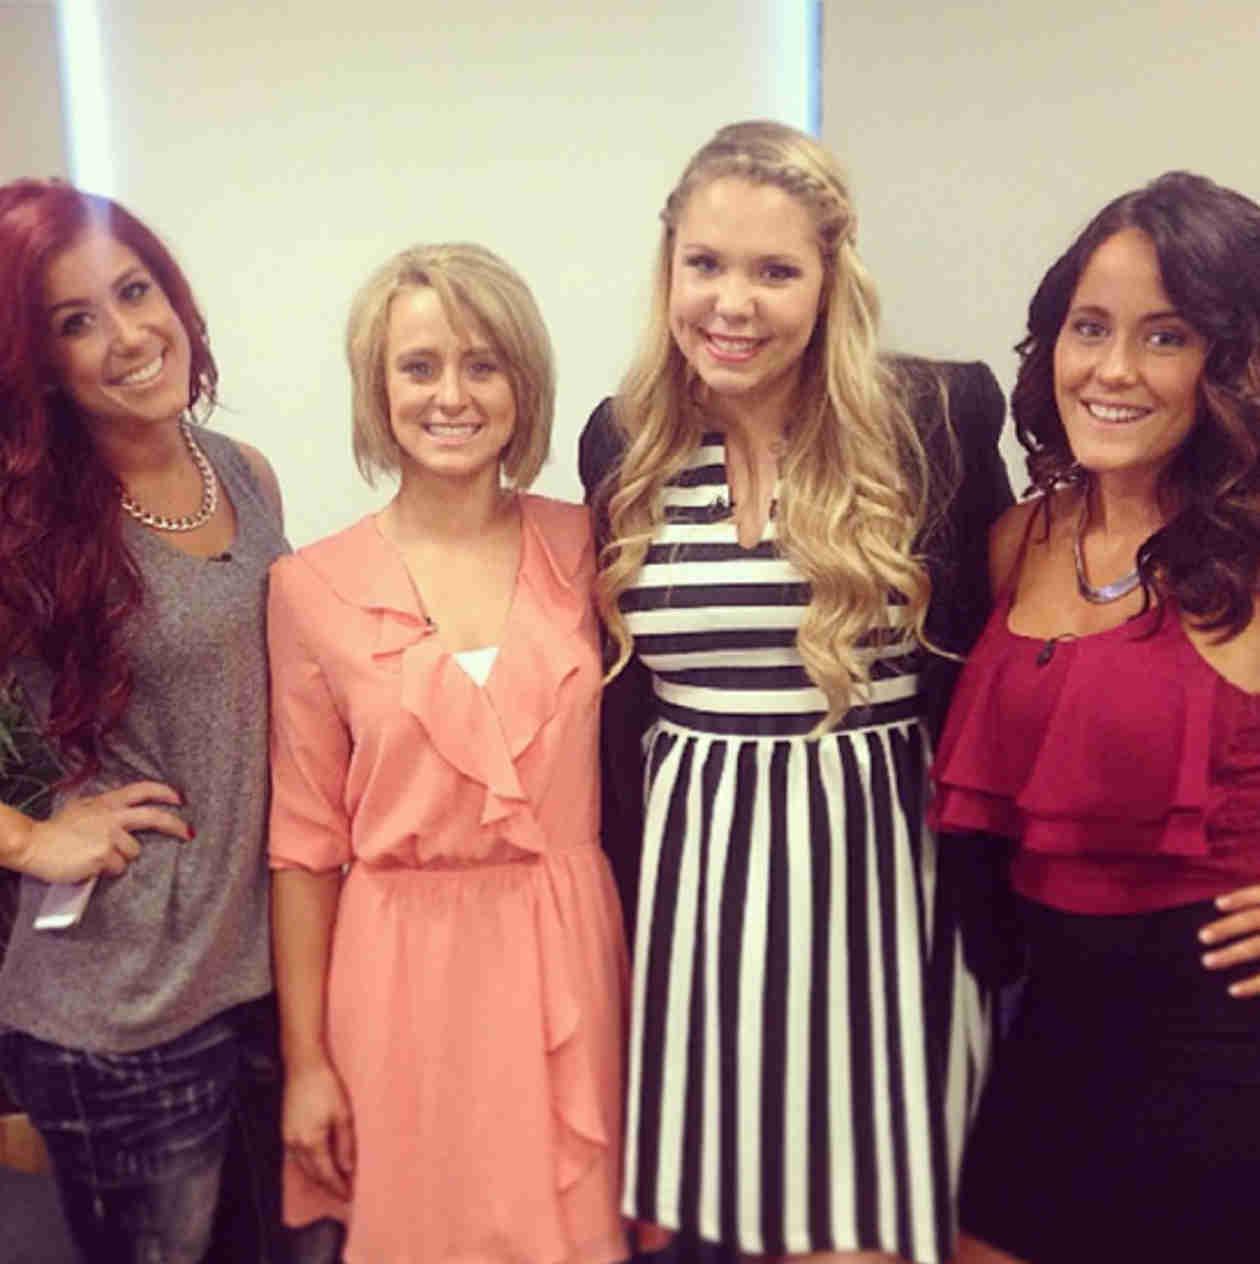 Teen Mom 2 Ladies Reunite! — See their Flawless Group Snapshot! (PHOTO)